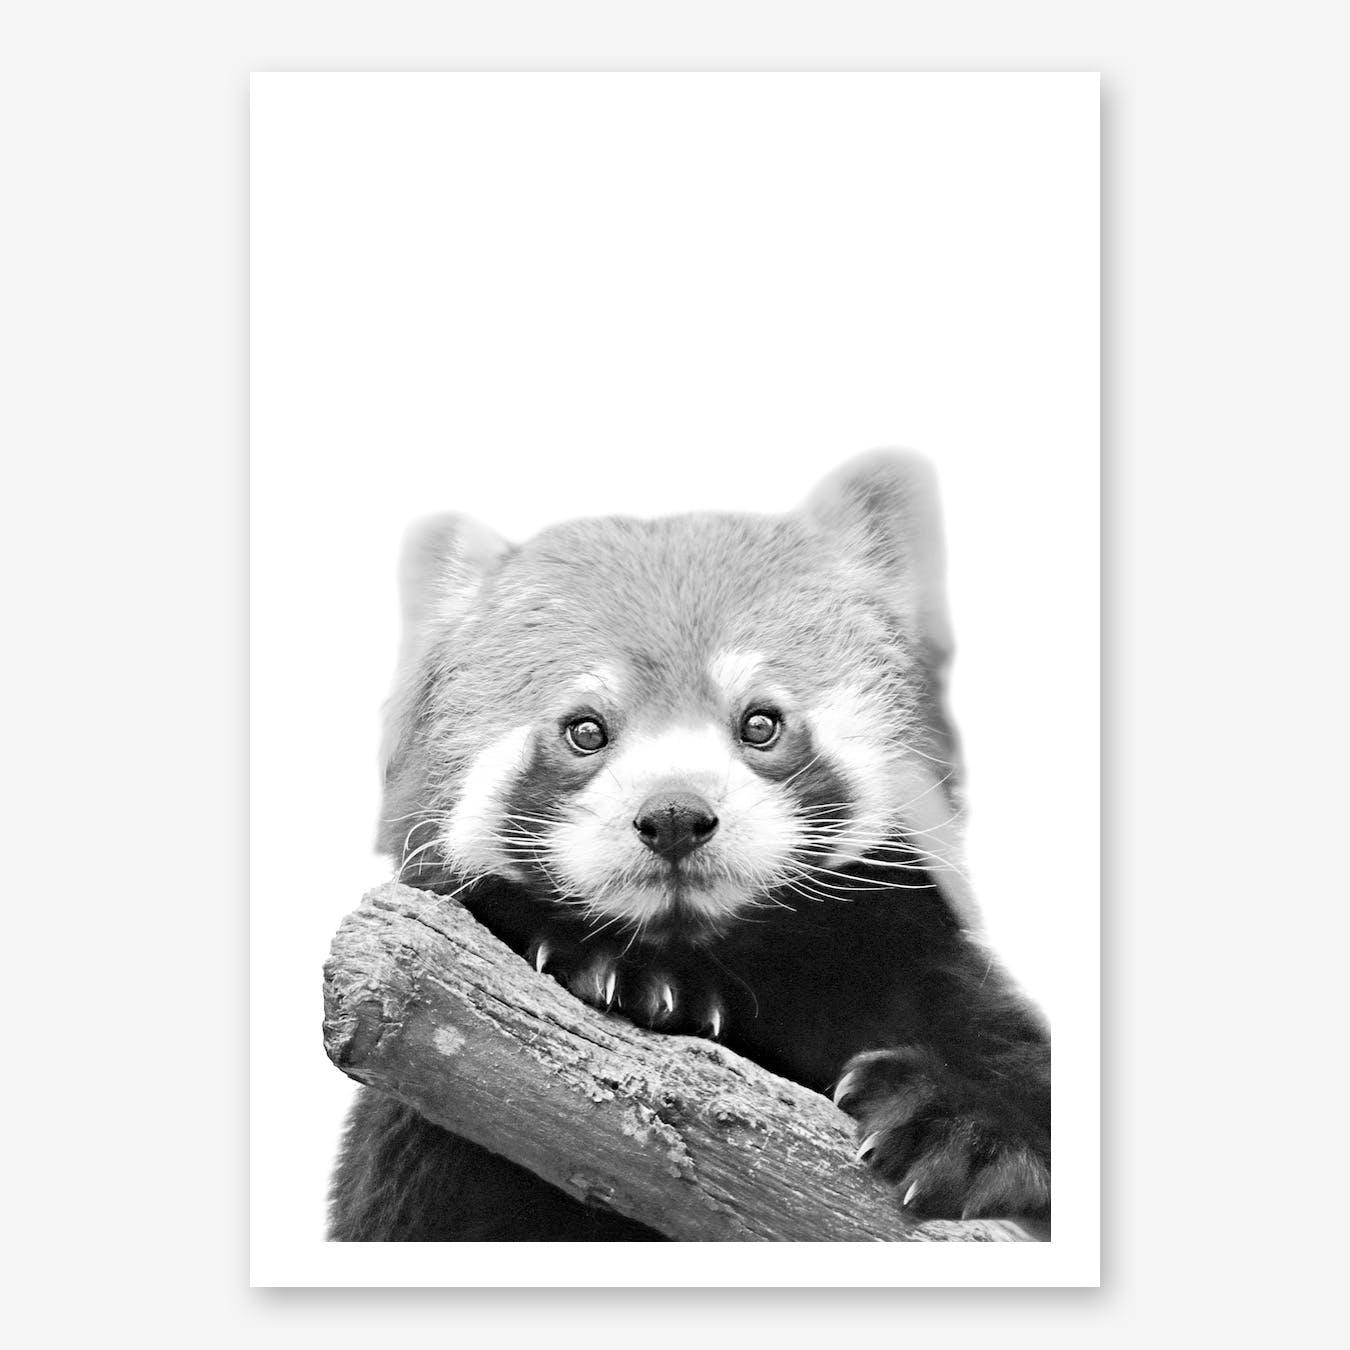 Little Red Panda in Print